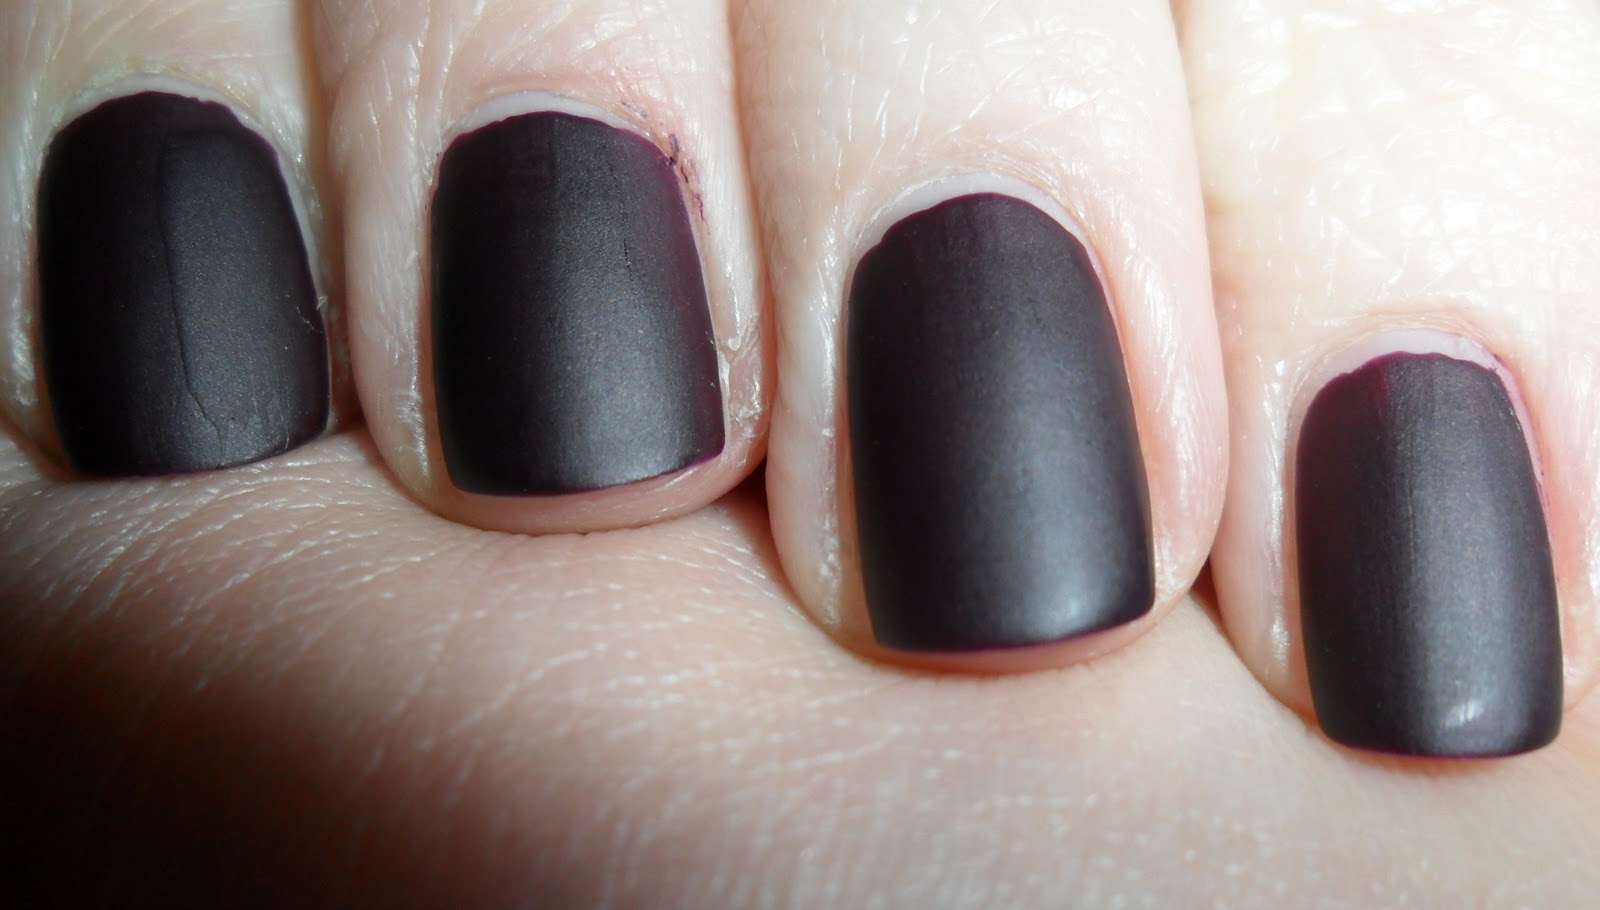 neonwei fairwind nagellack matt 40 midnight purple. Black Bedroom Furniture Sets. Home Design Ideas